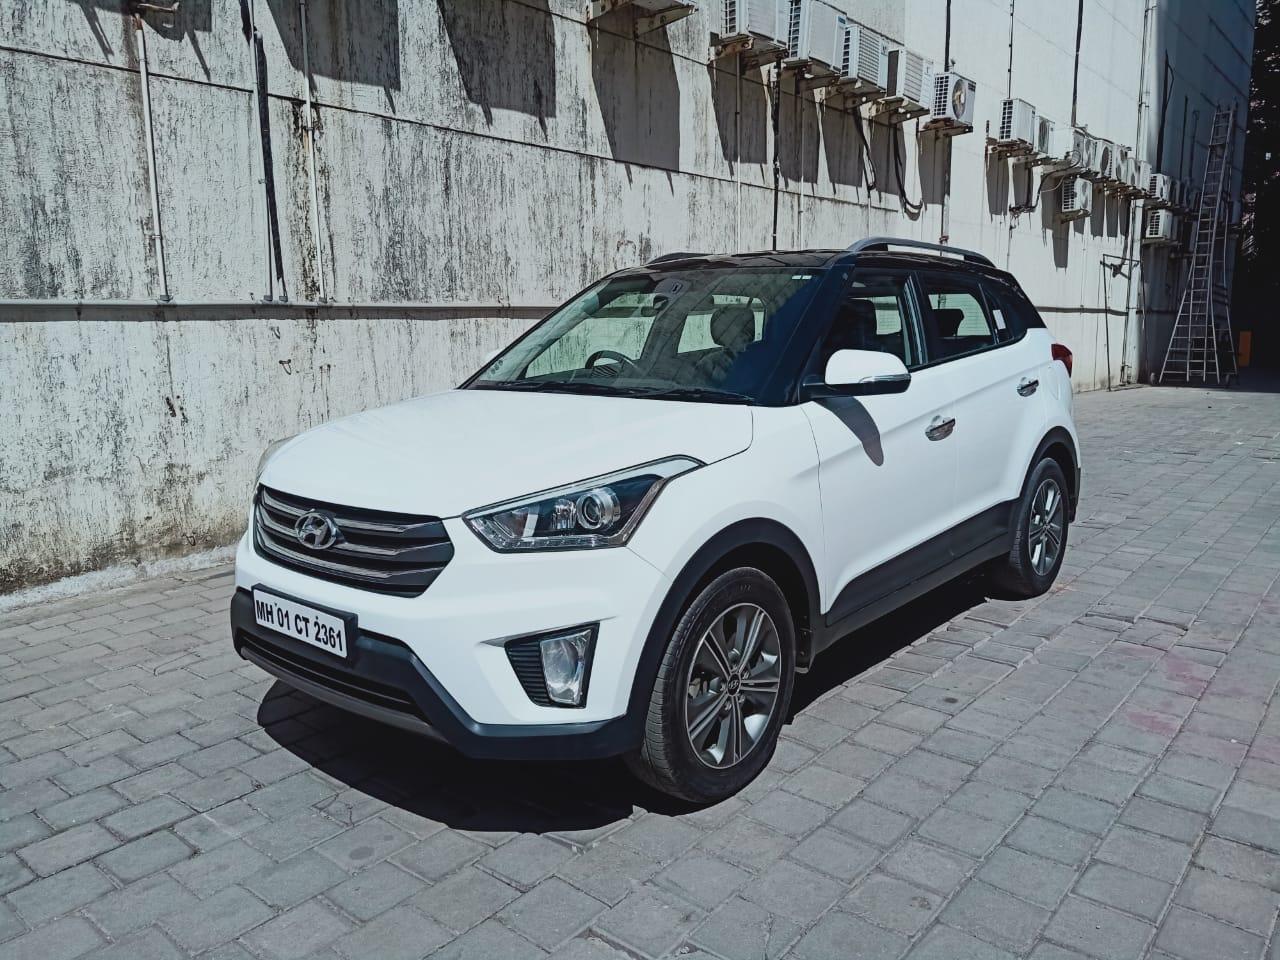 2017 Used Hyundai Creta 1.6 VTVT SX PLUS